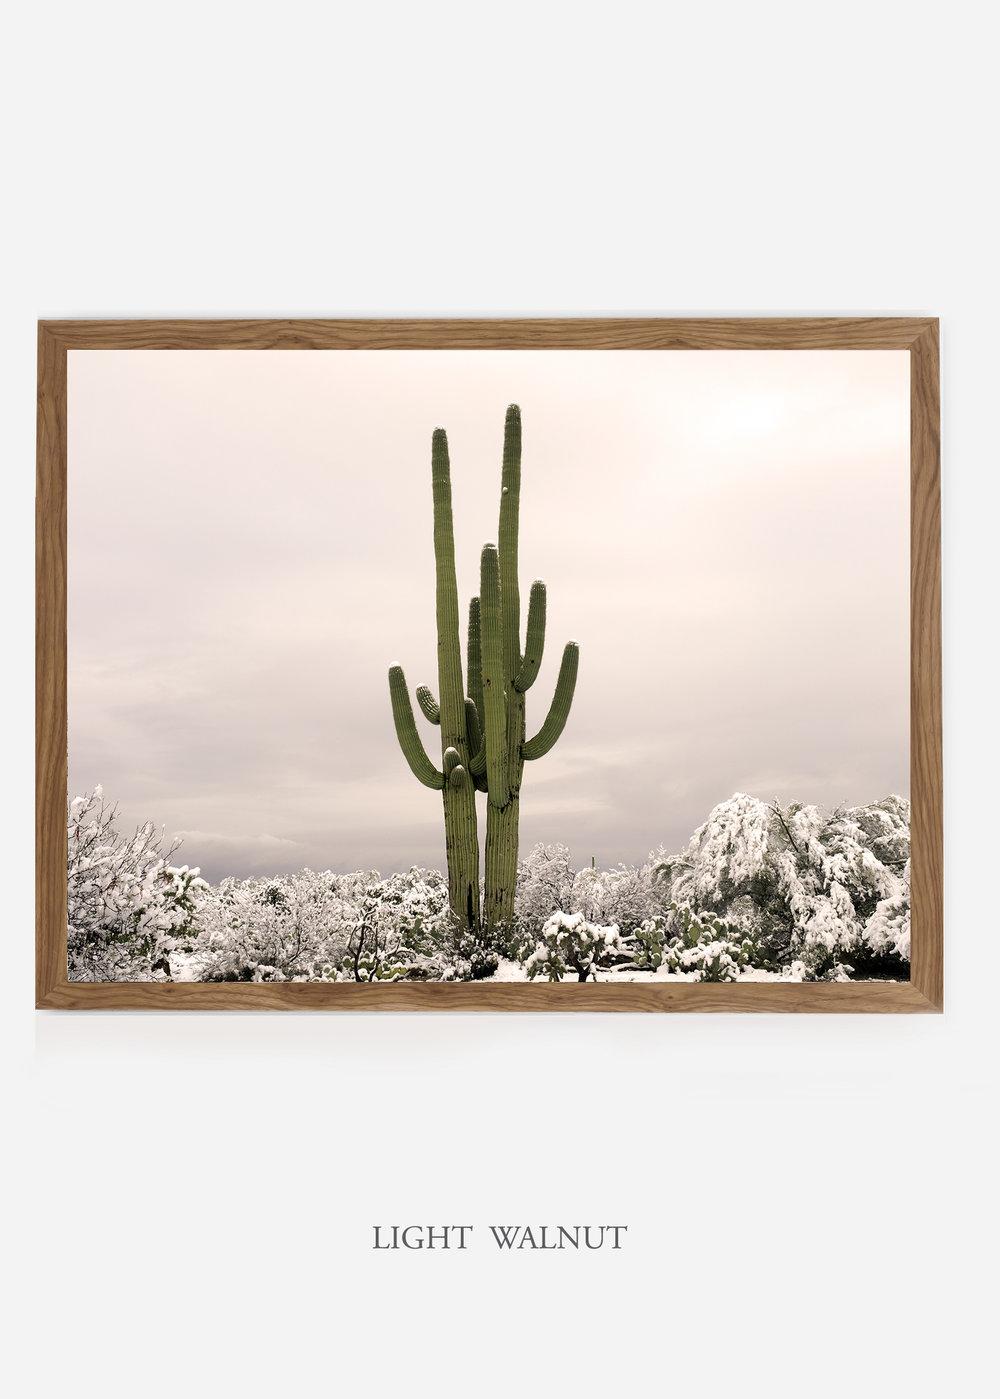 nomat_lightwalnutframe-saguaroNo.5-wildercalifornia-art-wallart-cactusprint-homedecor-prints-arizona-botanical-artwork-interiordesign.jpg